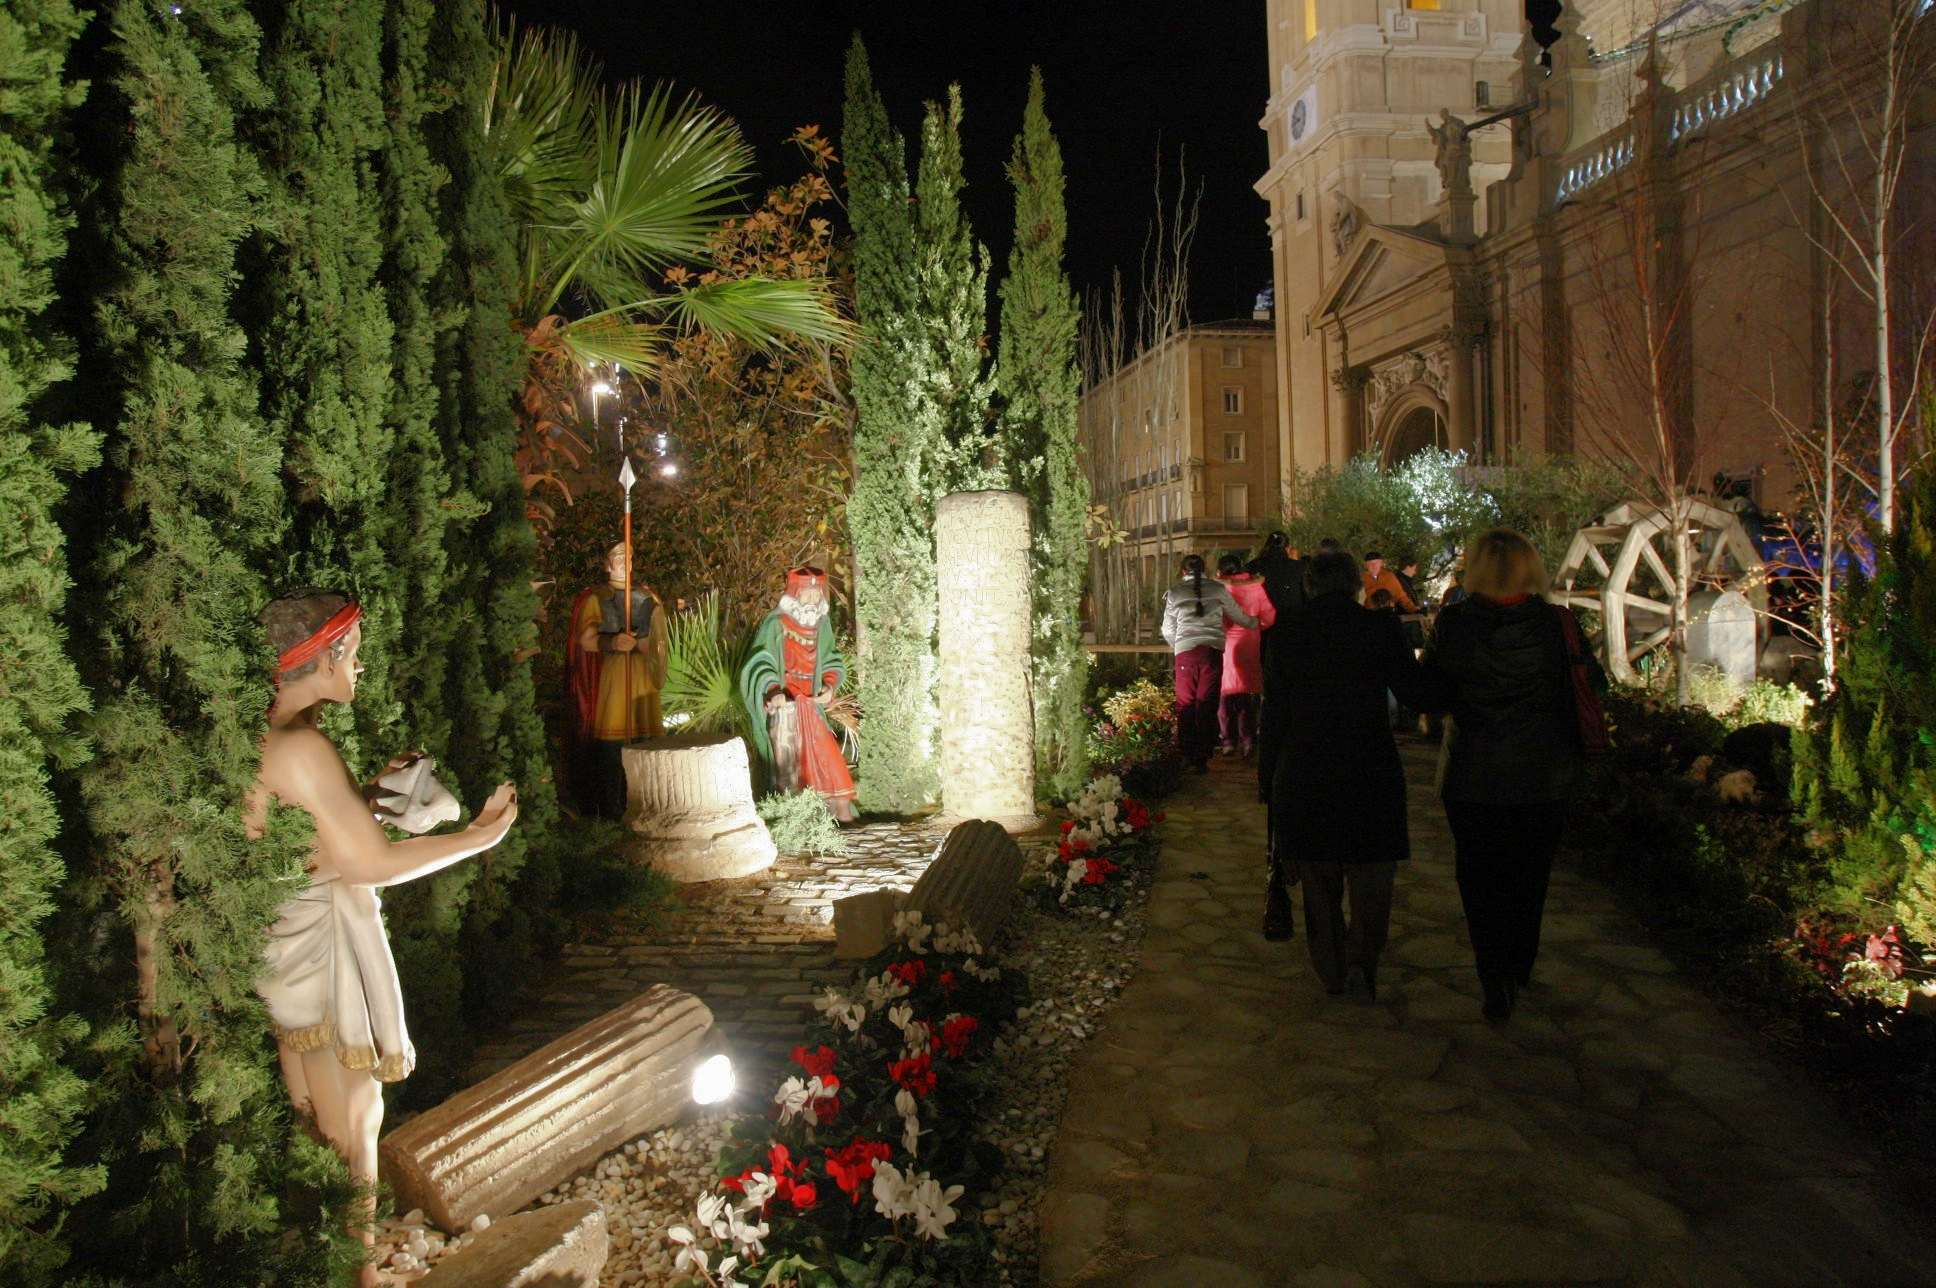 visita turistica zaragoza: